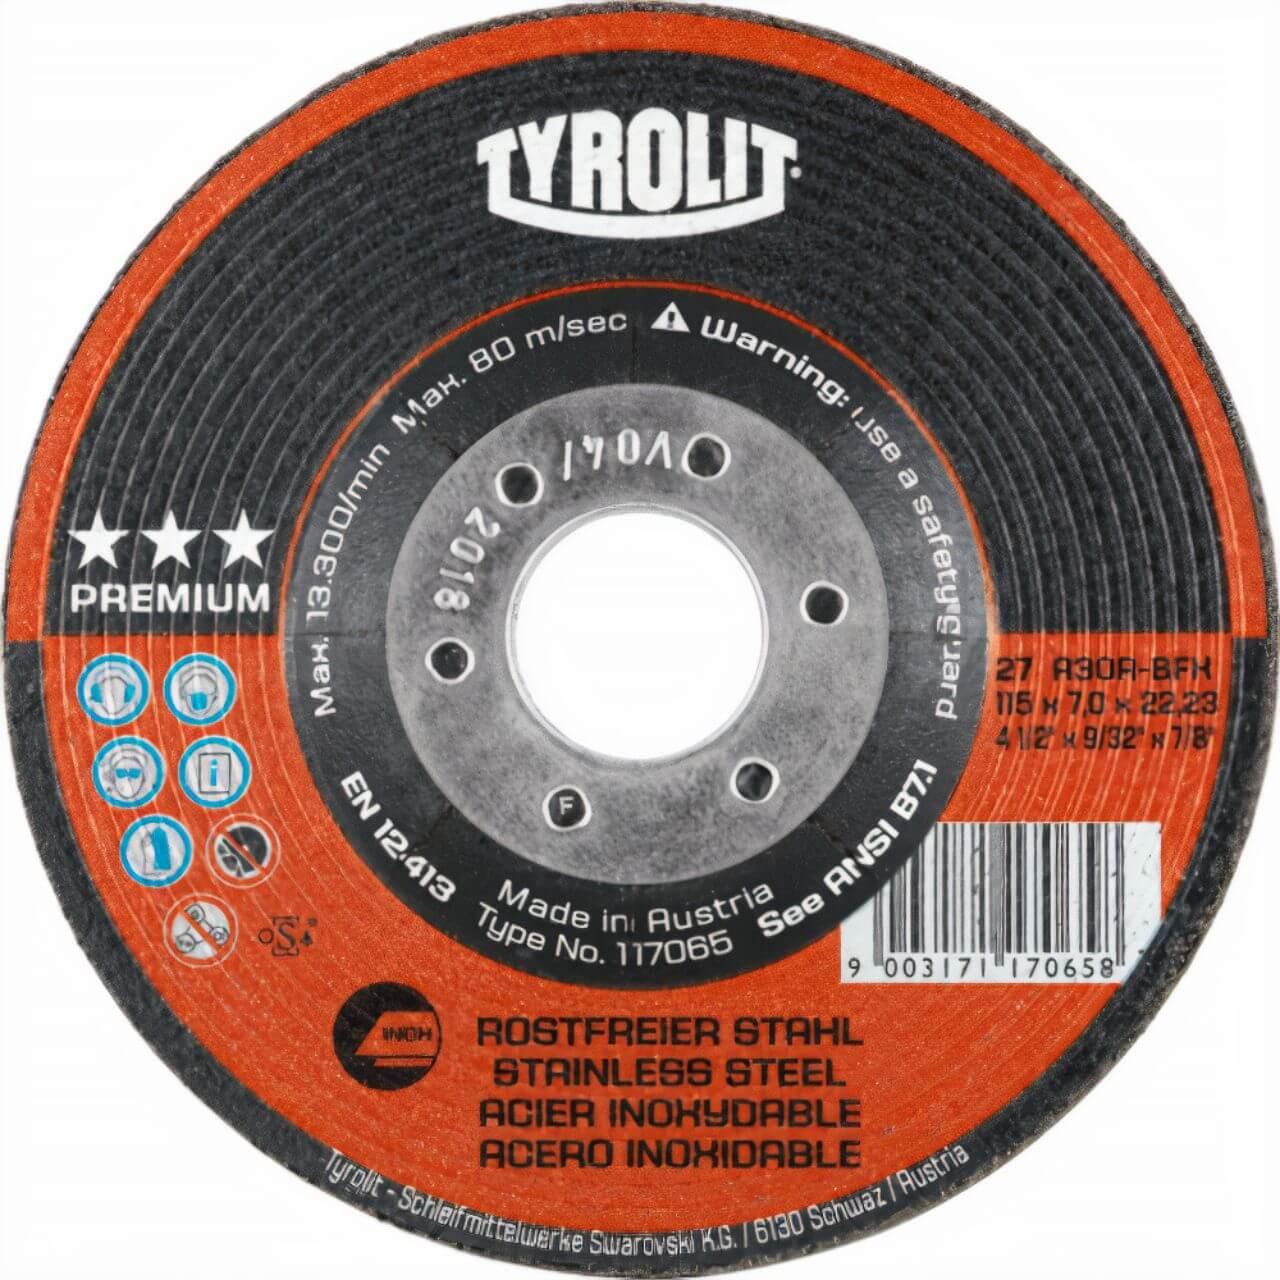 Tyrolit A30R 125x7x22 Inox Premium Grinding Disc